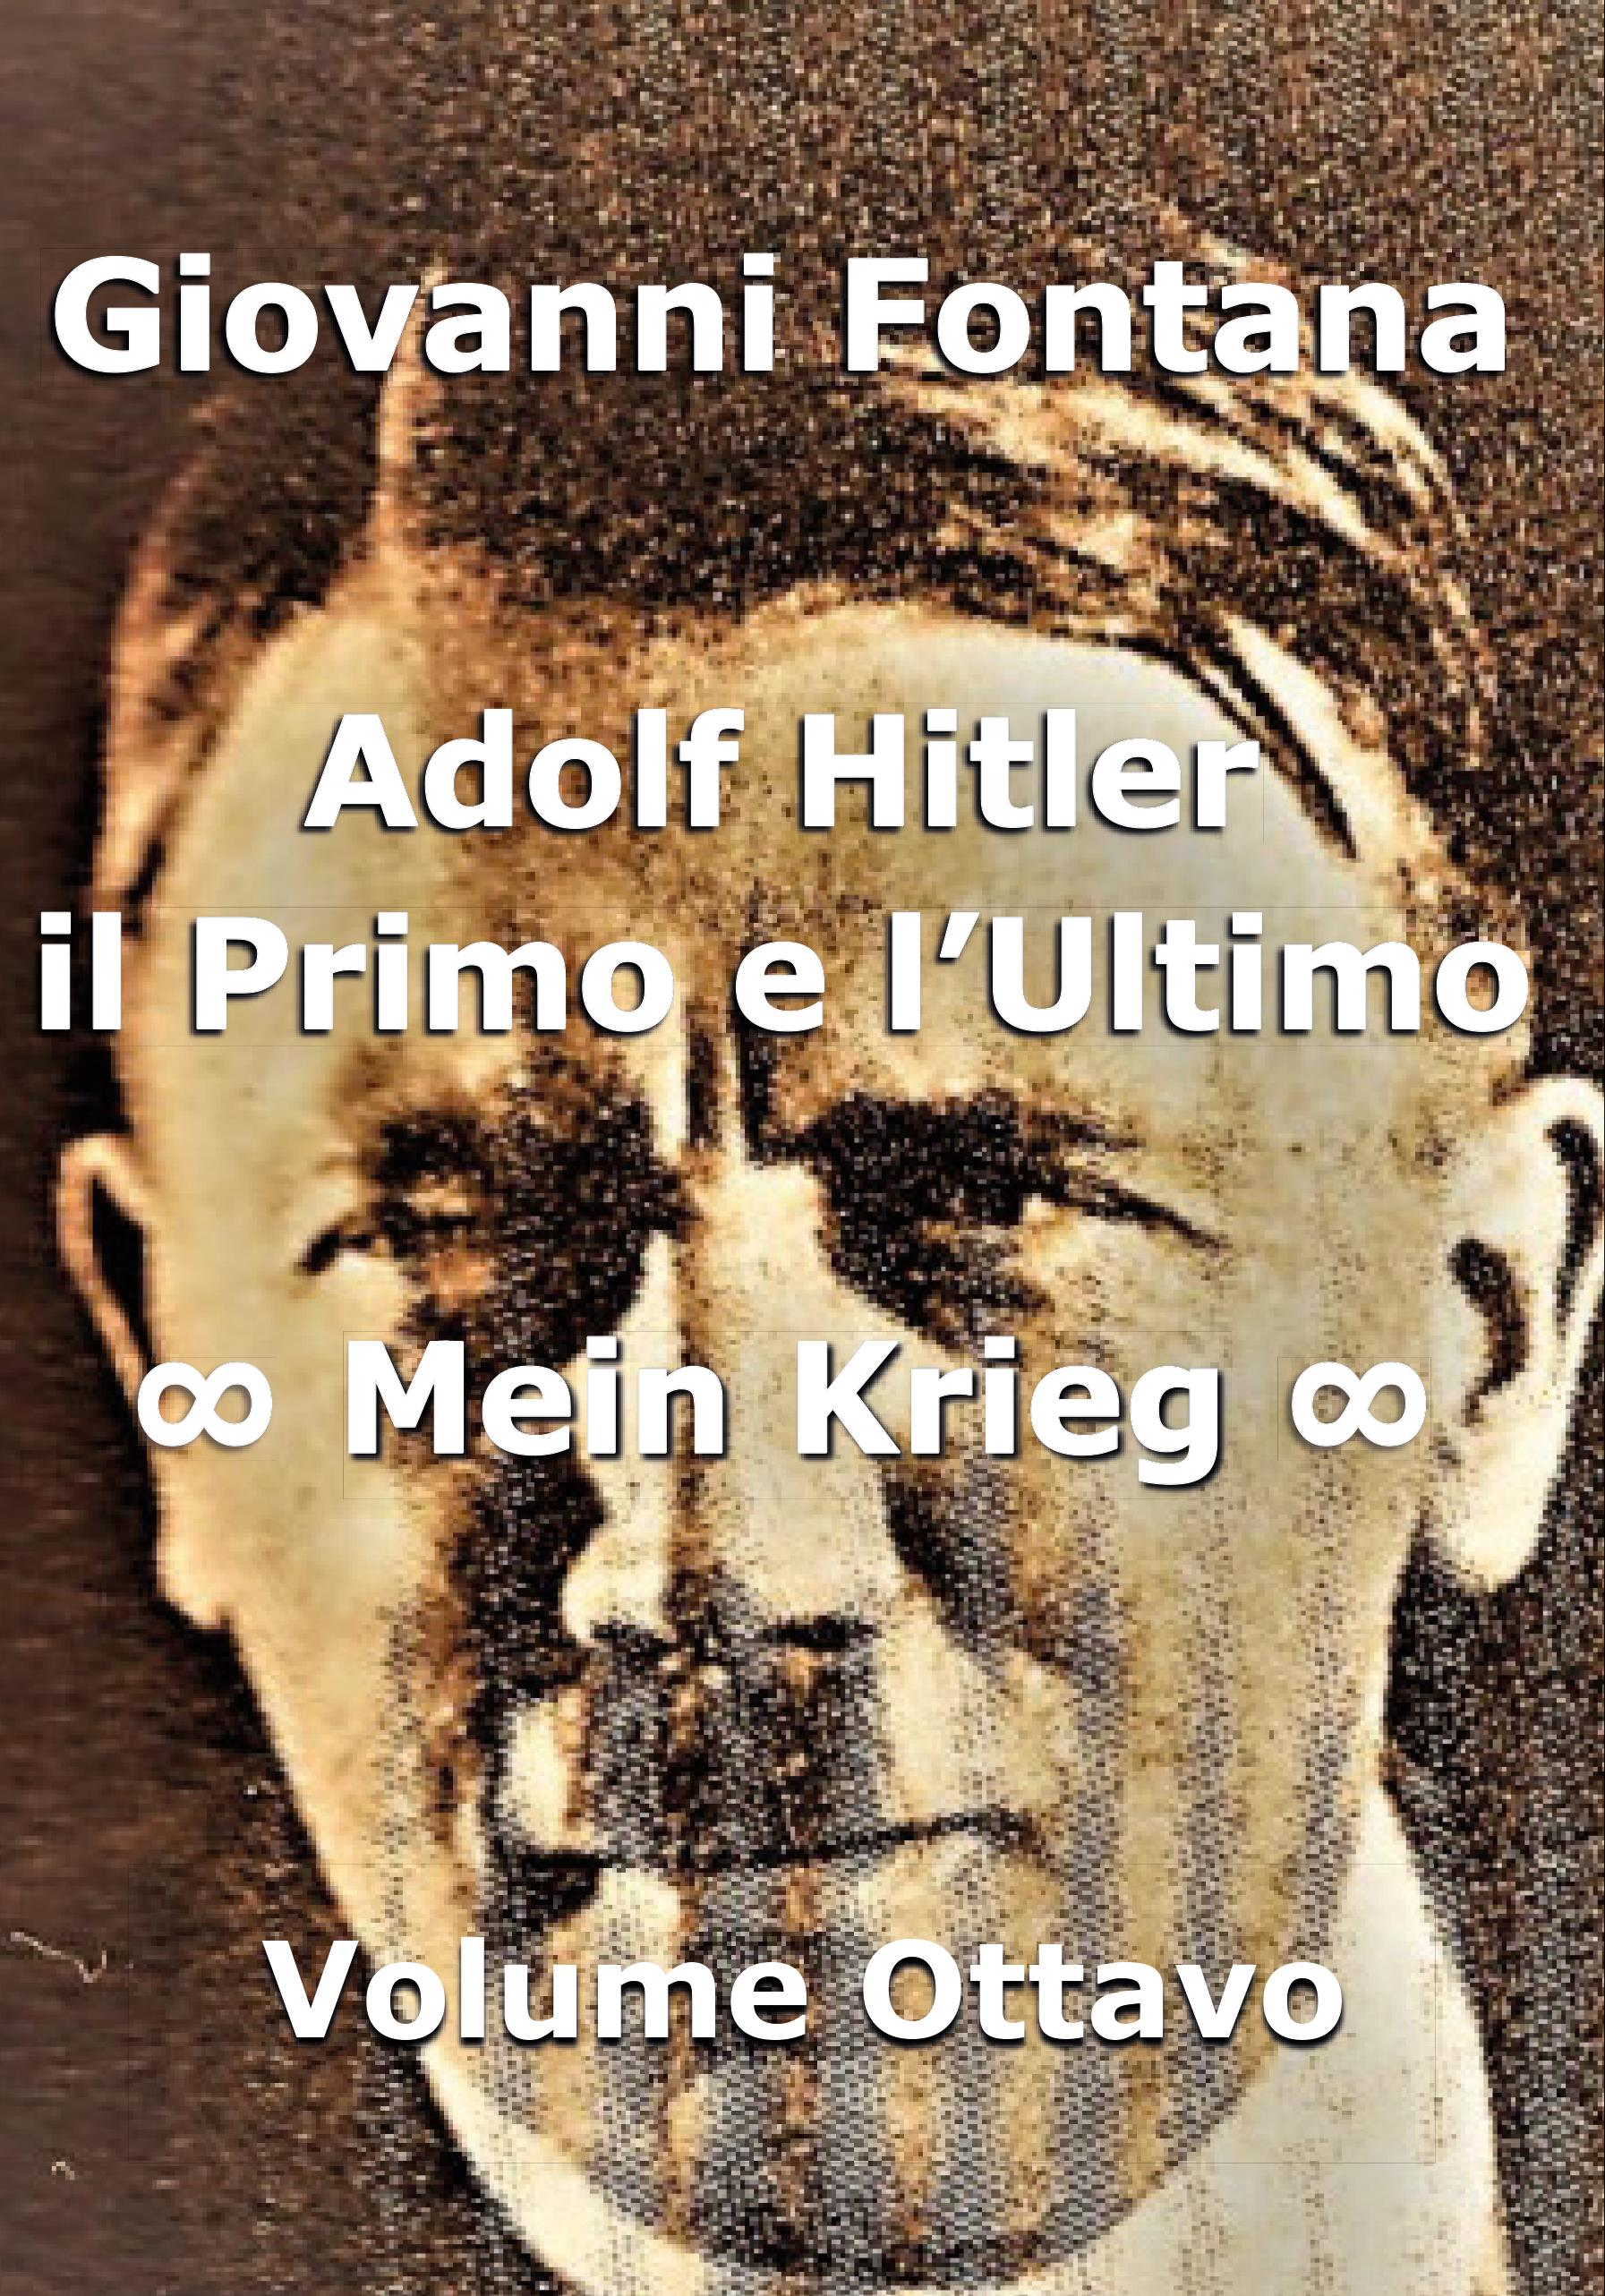 ADOLF HITLER. IL PRIMO E L'ULTIMO. MEIN KRIEG. OTTAVO VOLUME